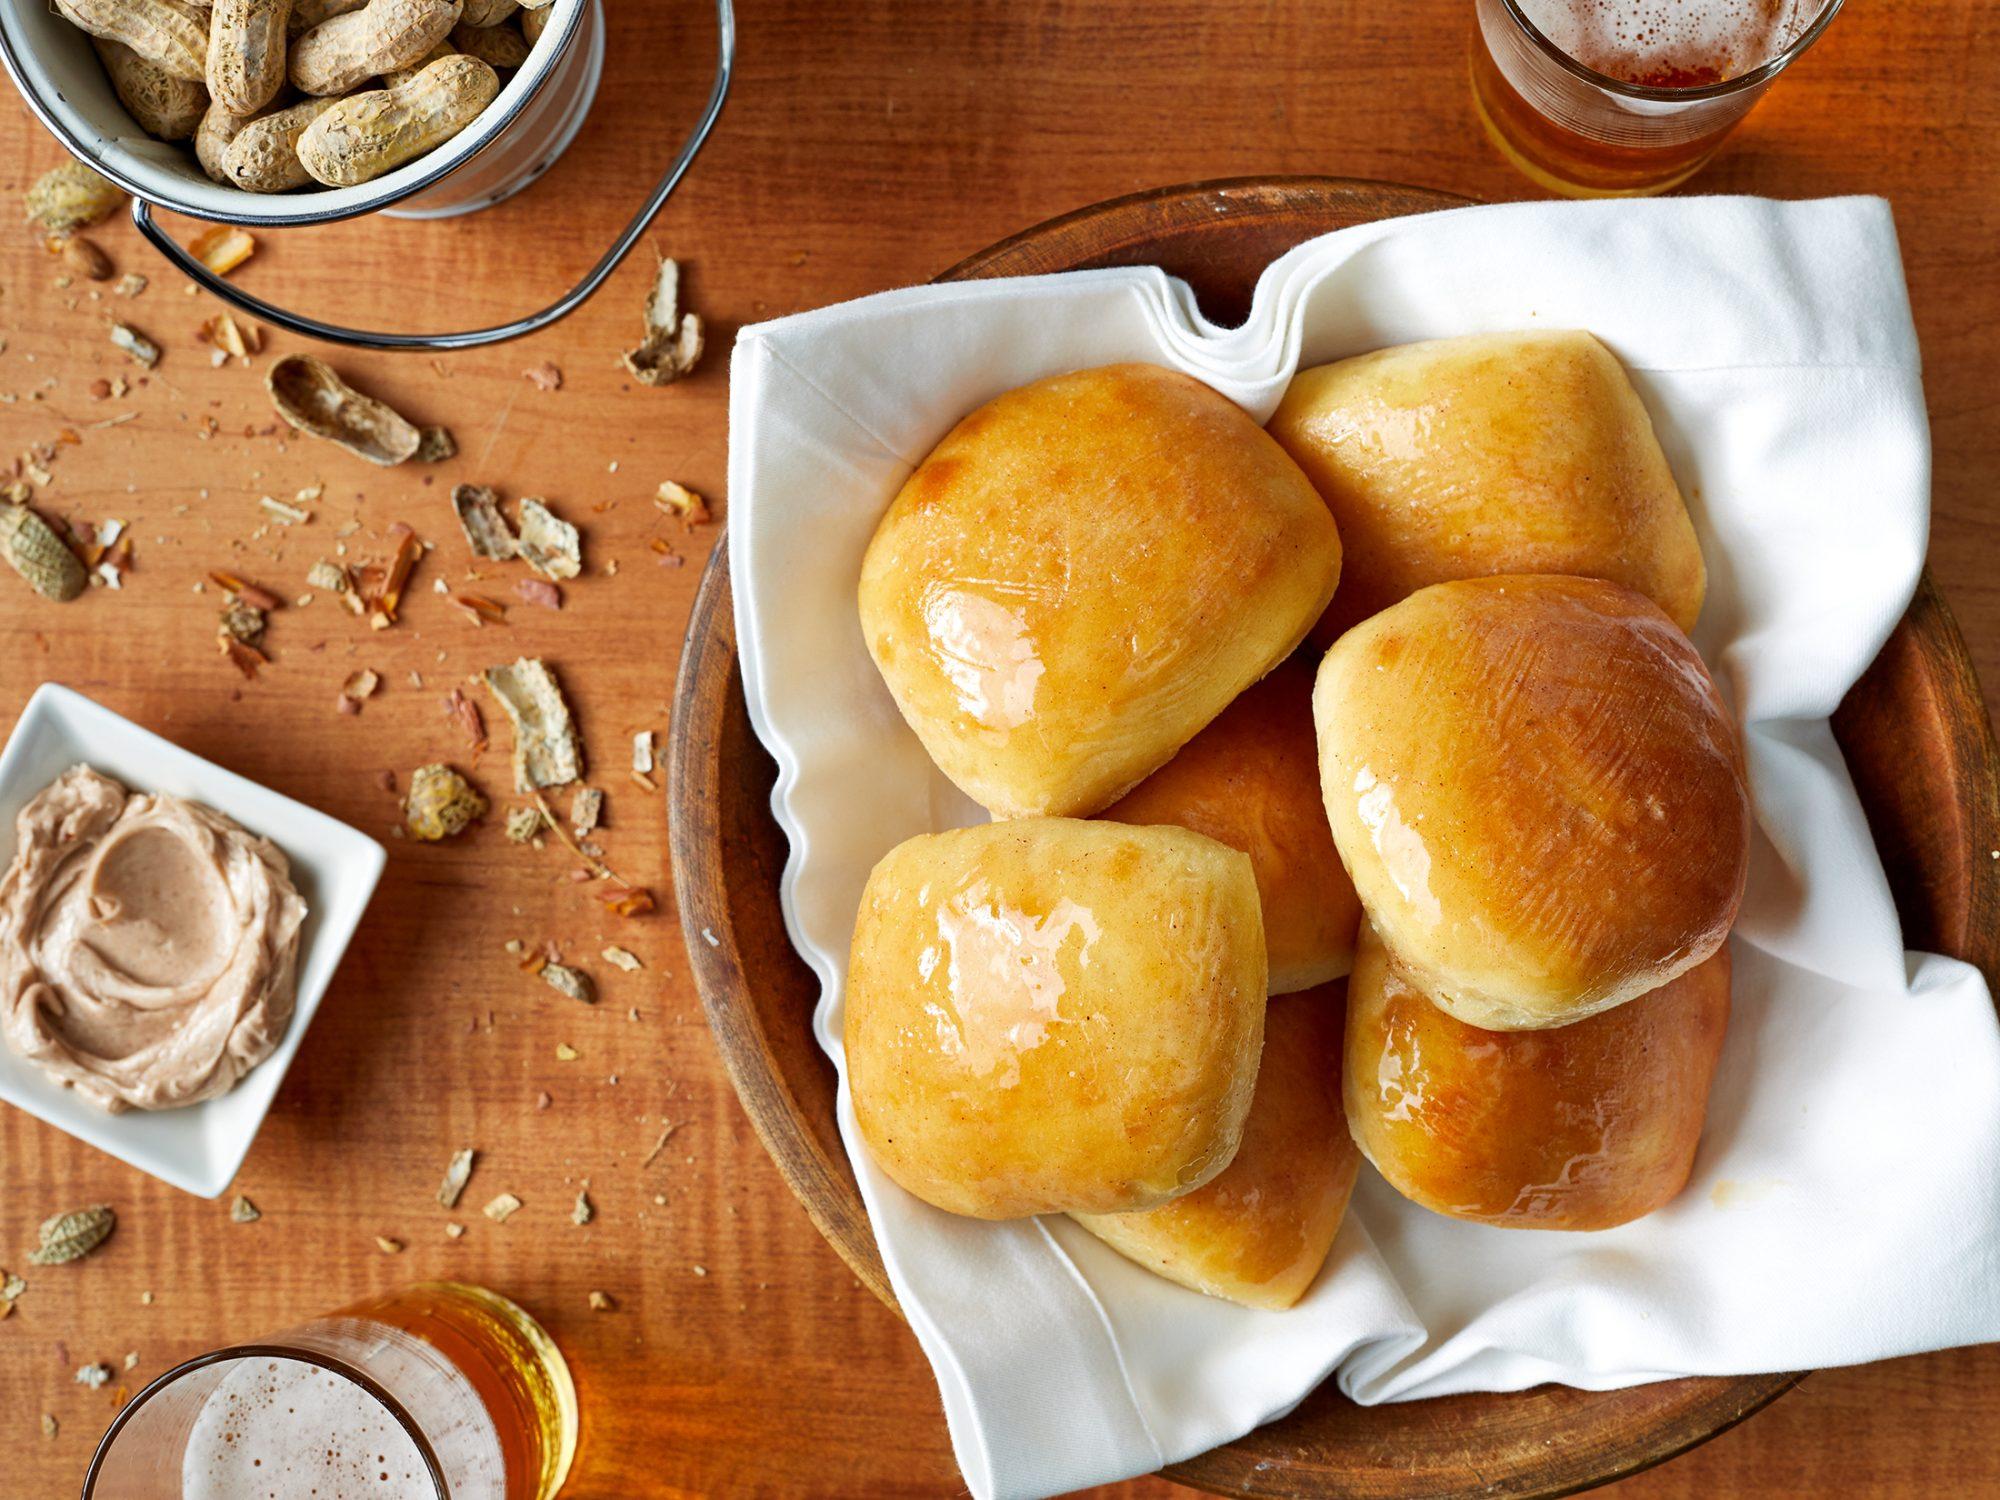 Copycat Texas Roadhouse Rolls with Cinnamon-Honey Butter